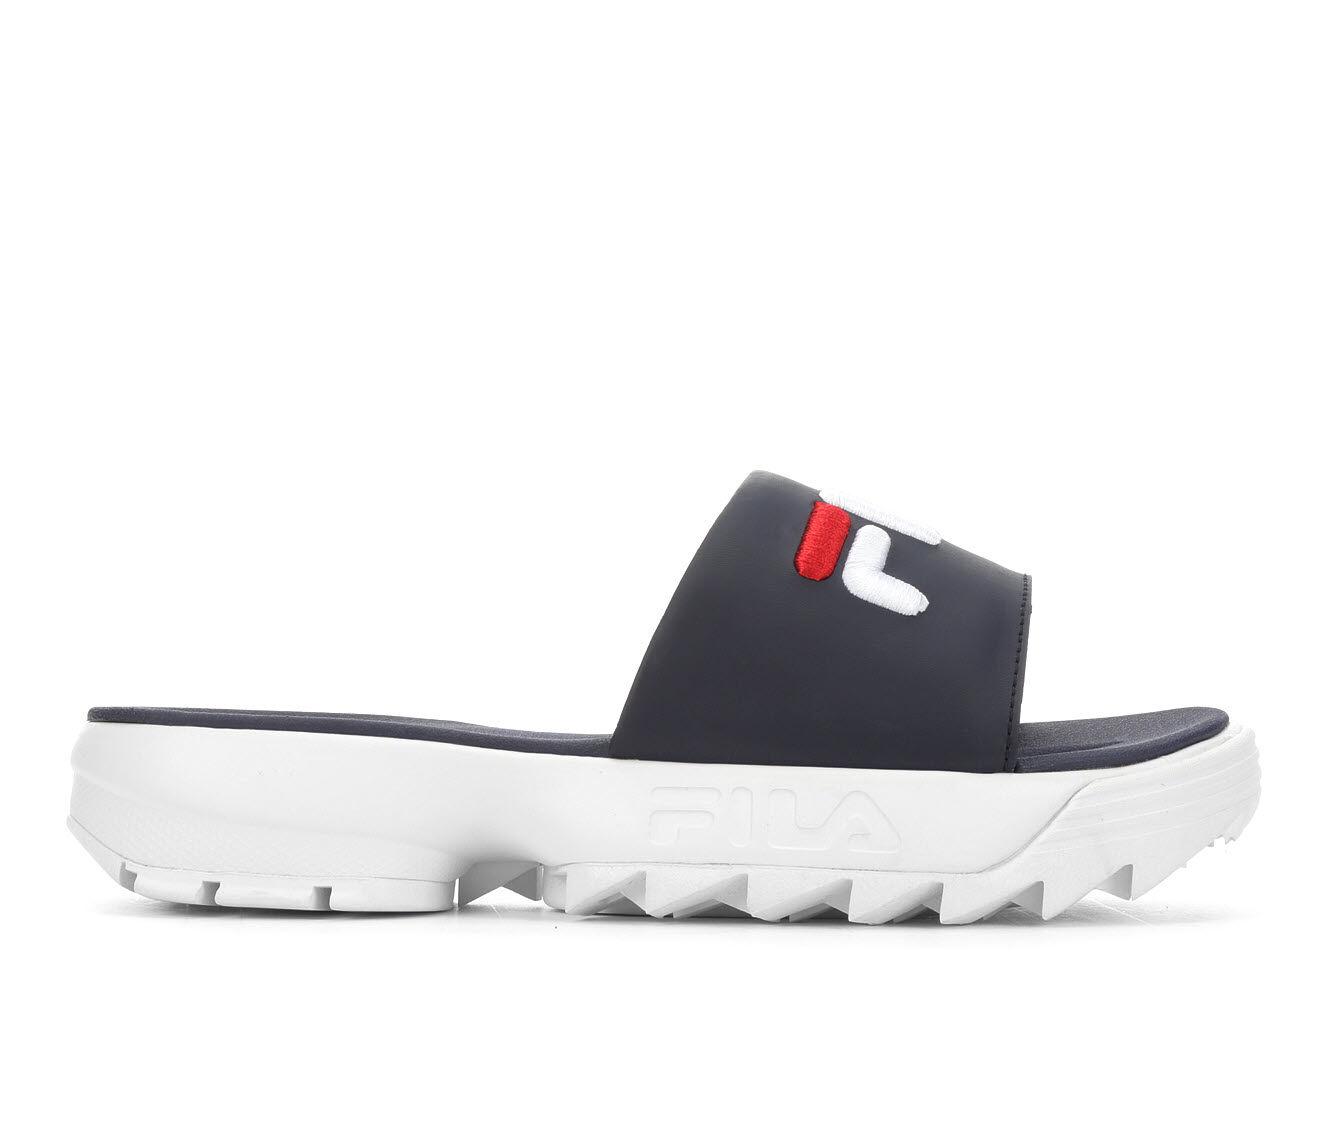 purchase discount Women's Fila Disruptor Bold Slide Flatform Sandals Navy/White/Red